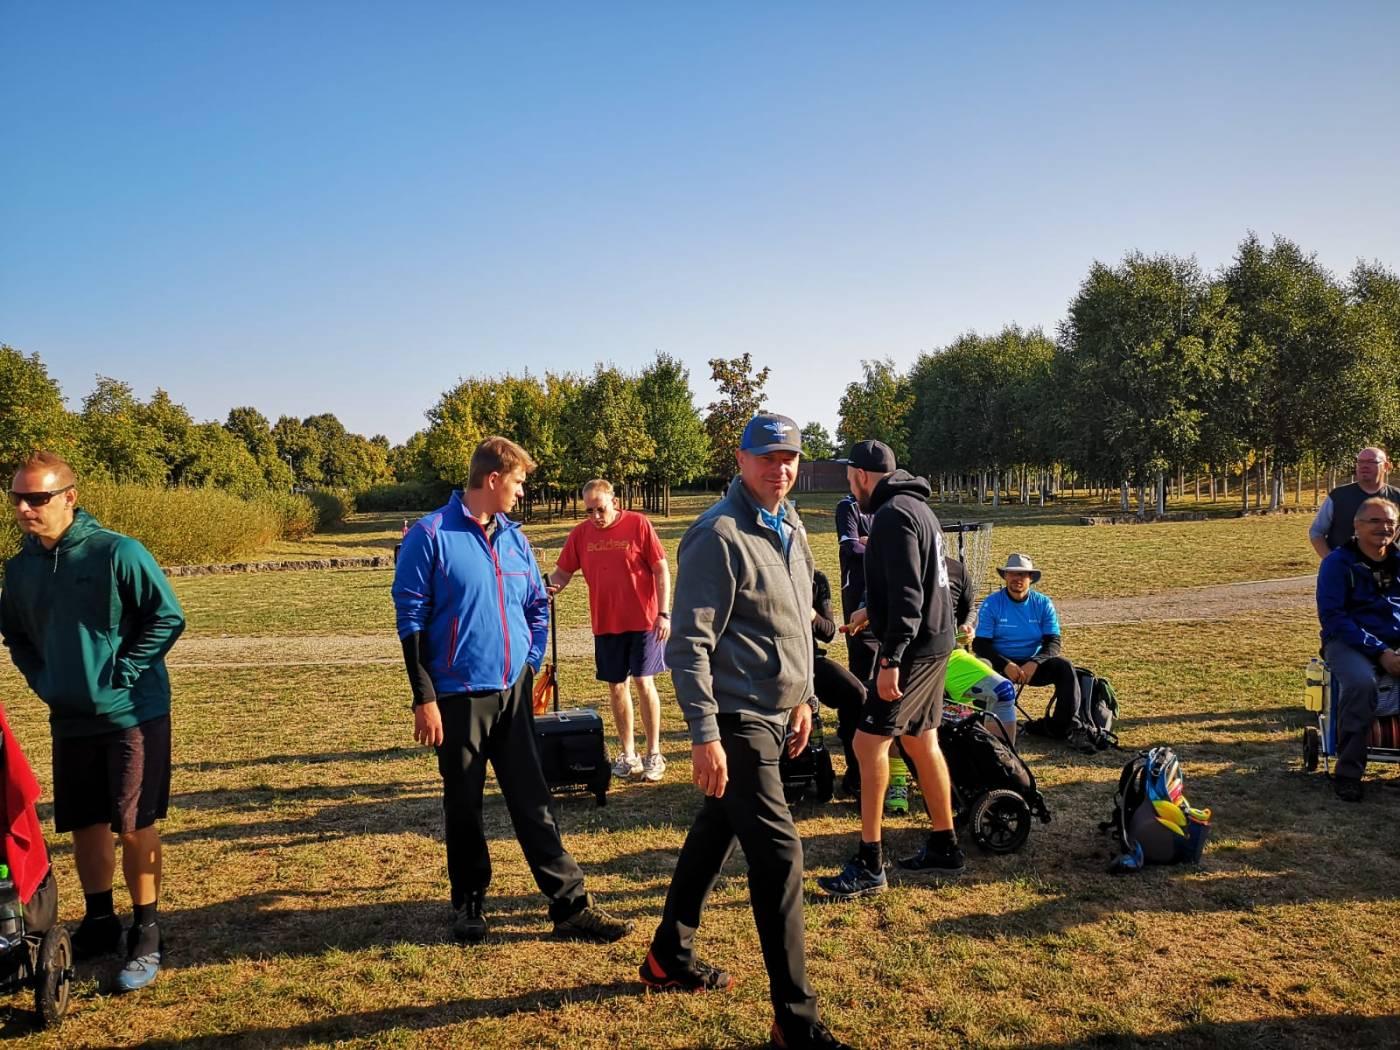 2018-09-02_NDS Landesmeisterschaft Discgolf Hannover 2018_001